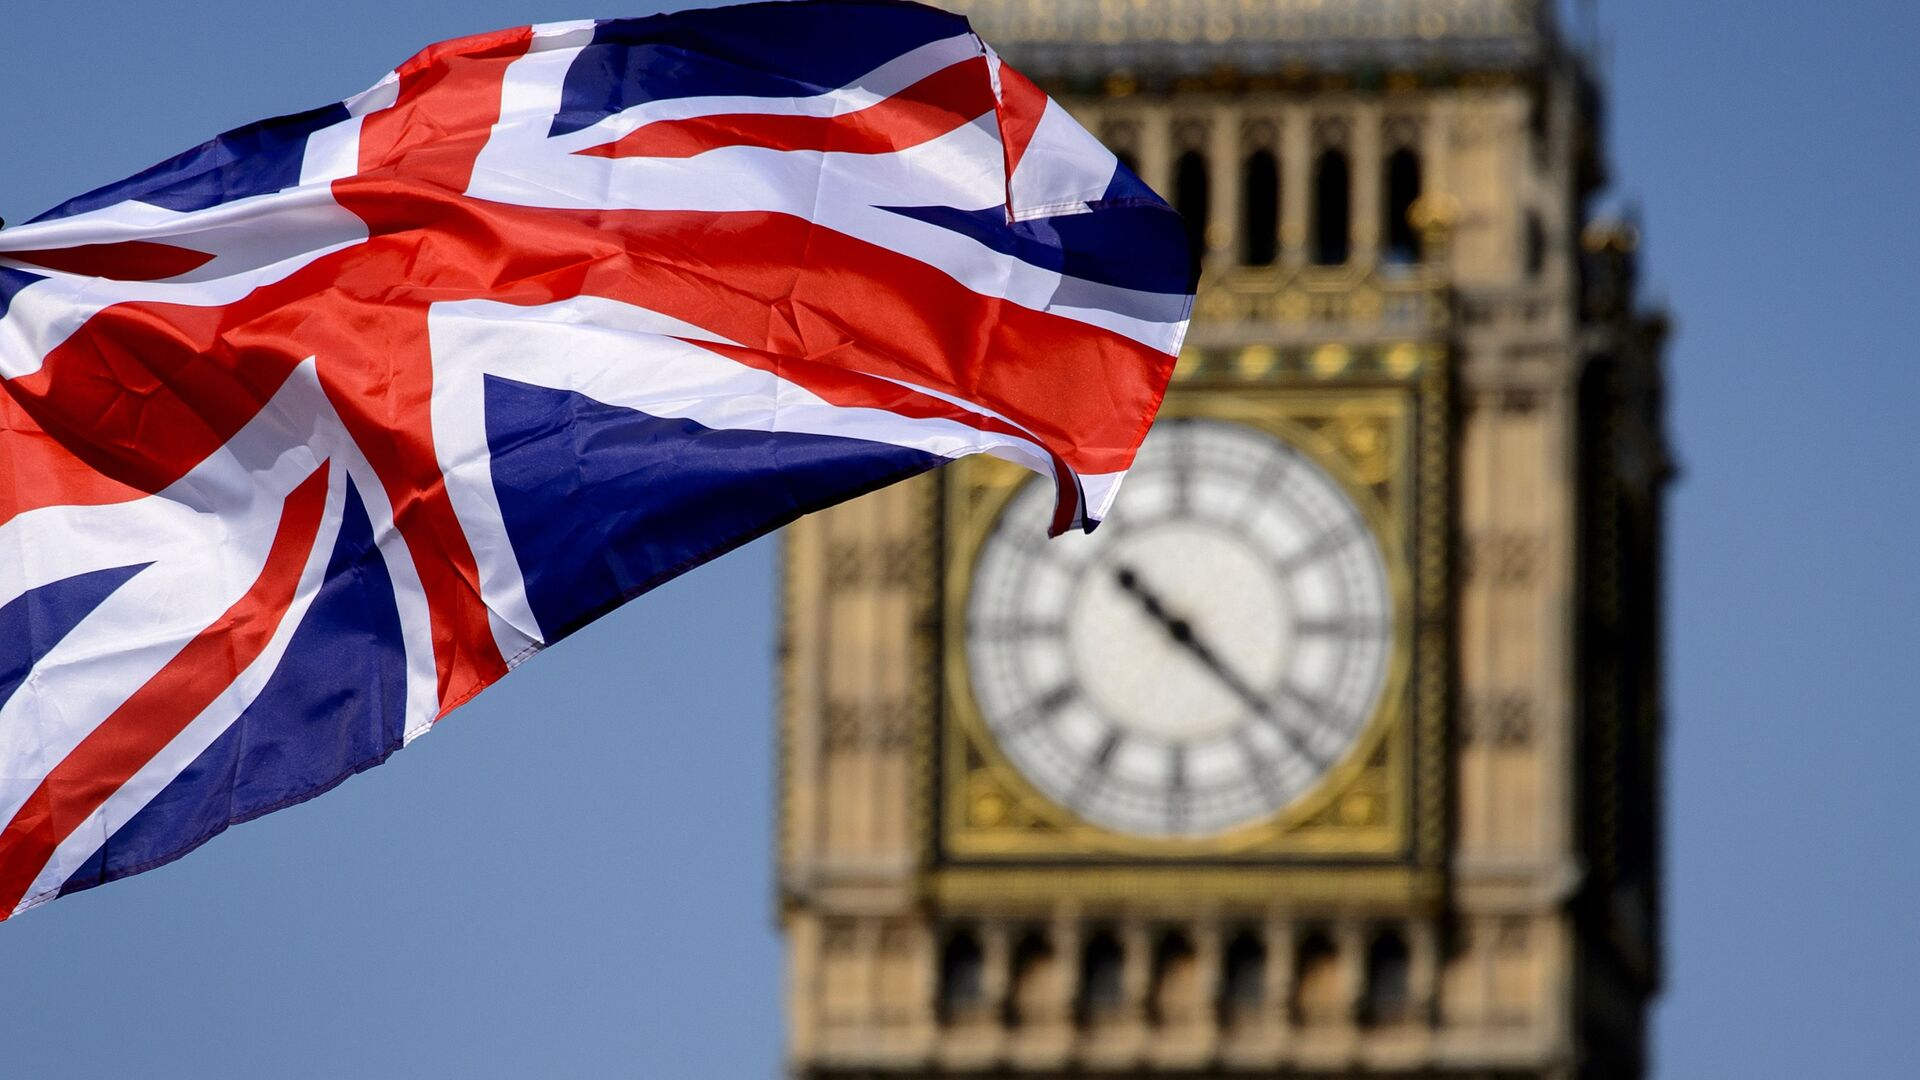 Британский флаг на фоне Биг-Бена в Лондоне - Sputnik Ўзбекистон, 1920, 16.09.2021